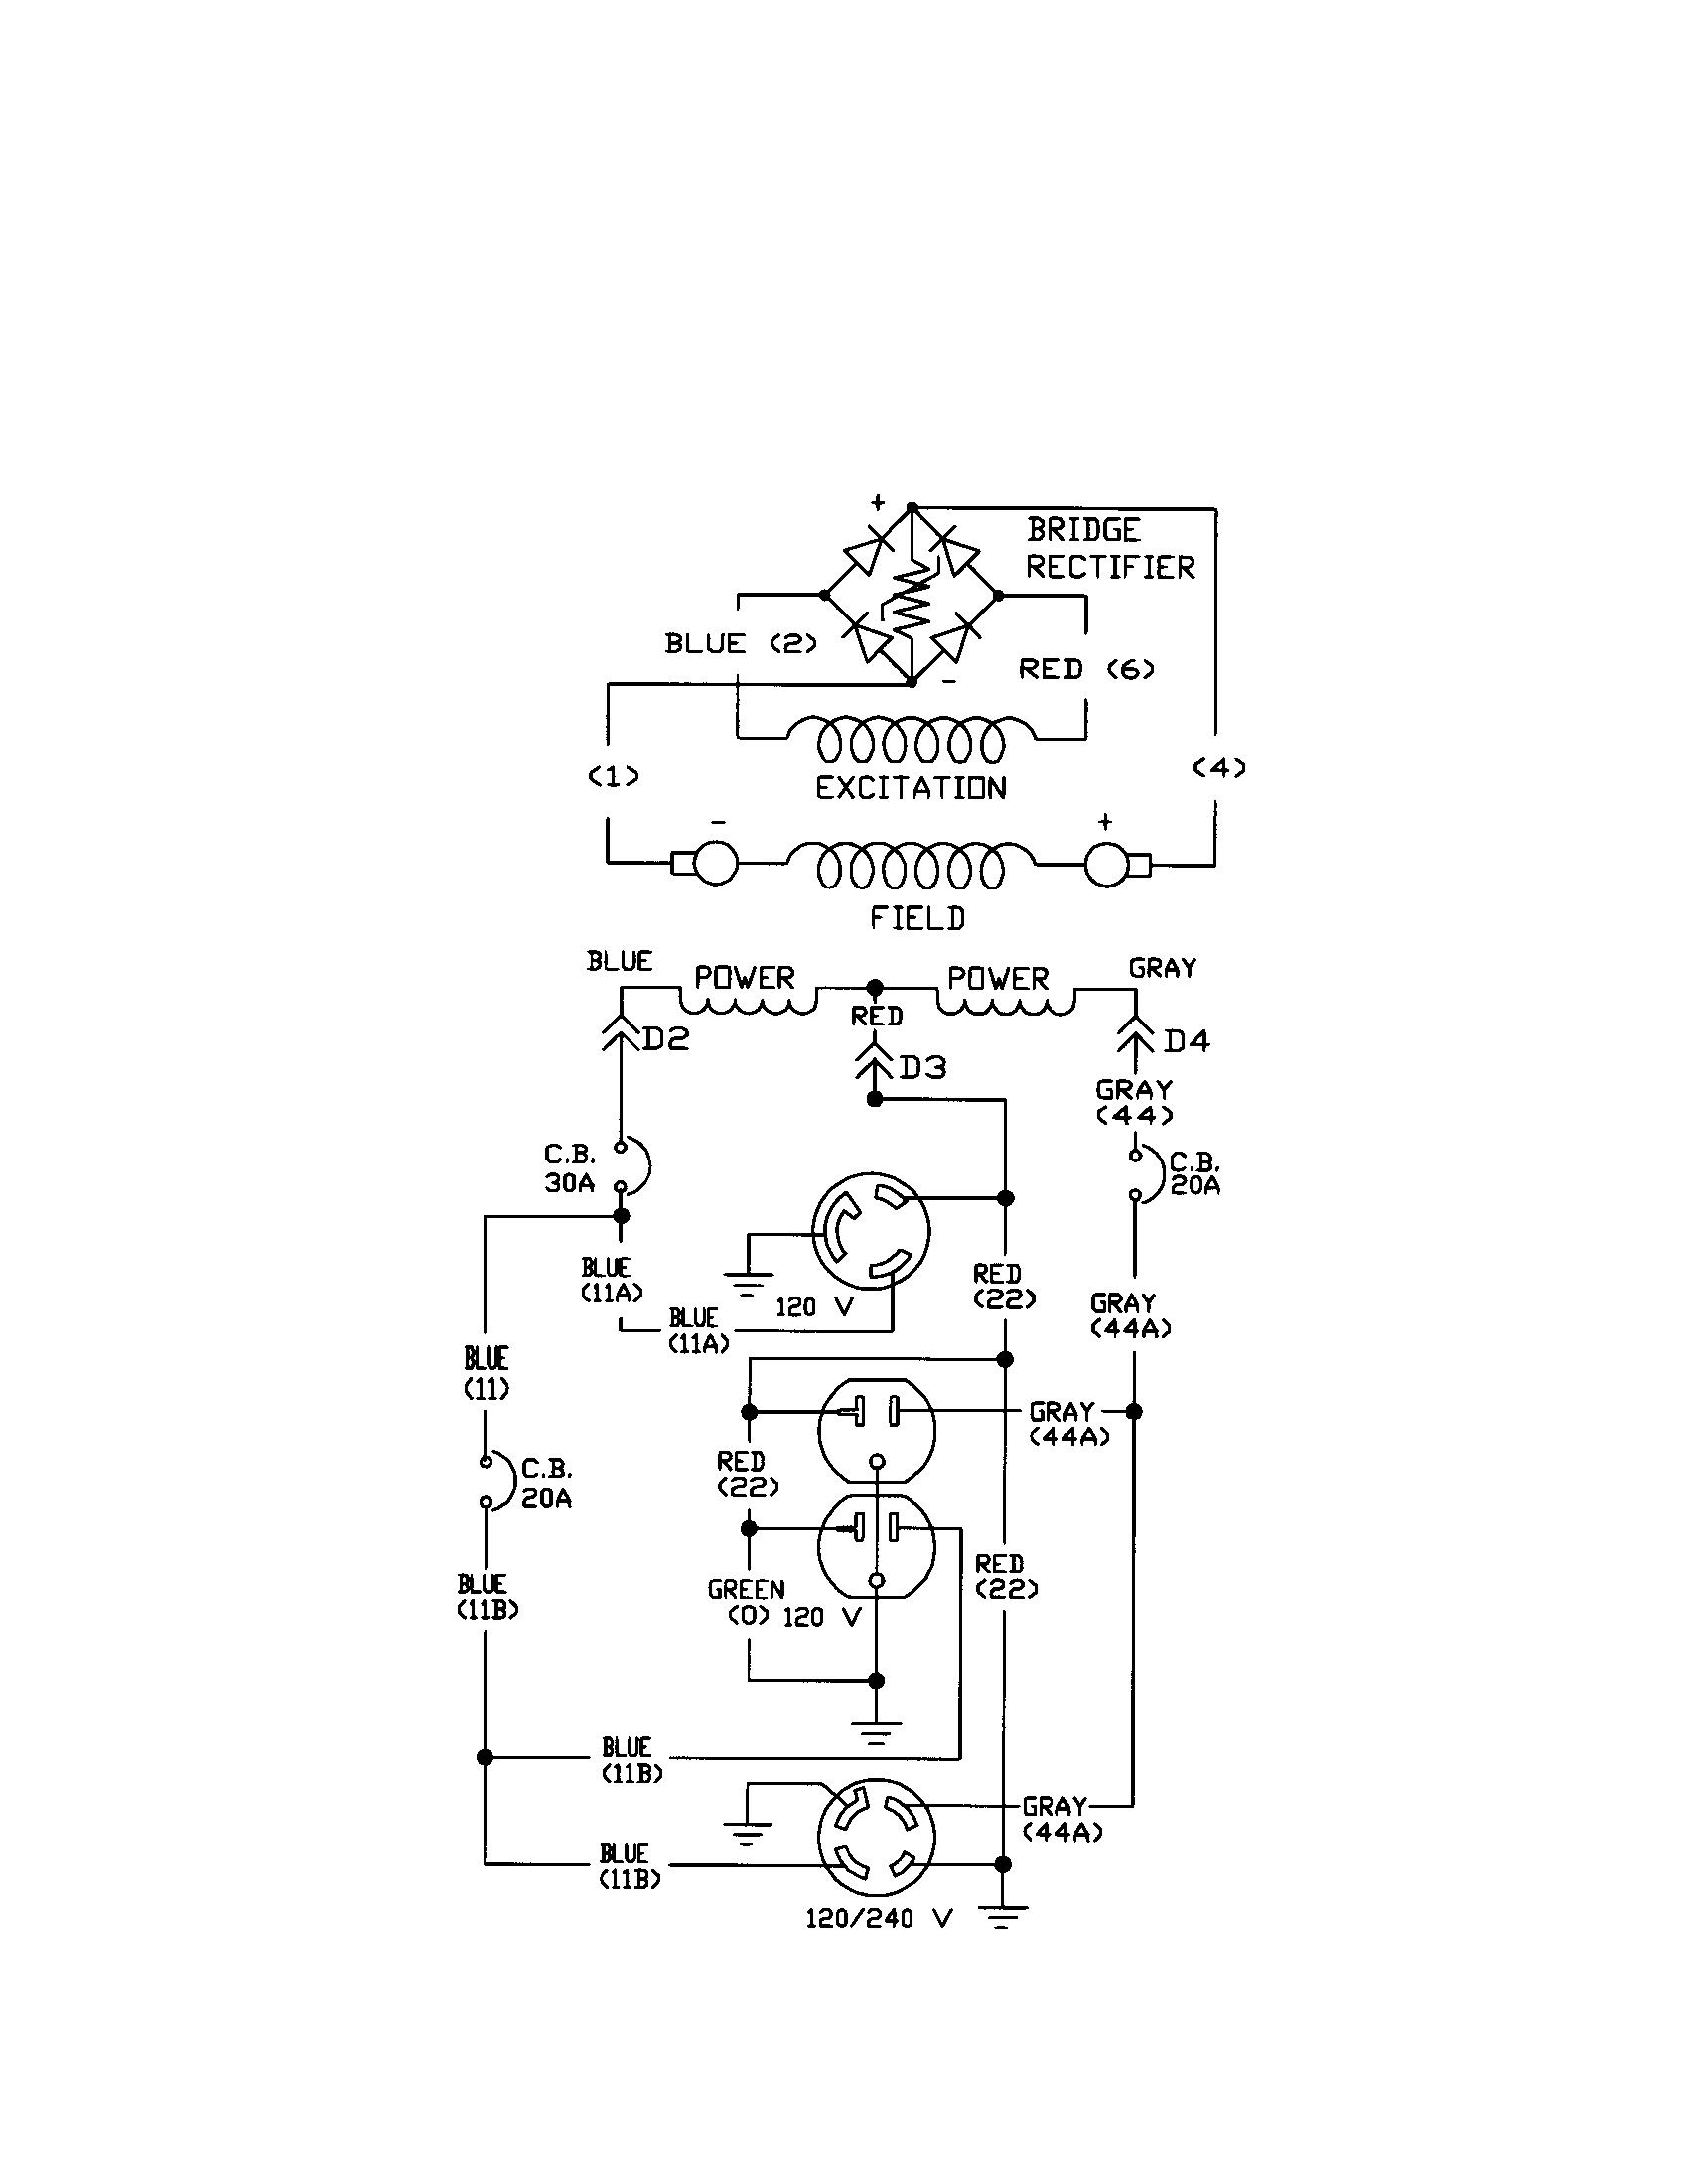 Generac model 1652-0 generator genuine parts